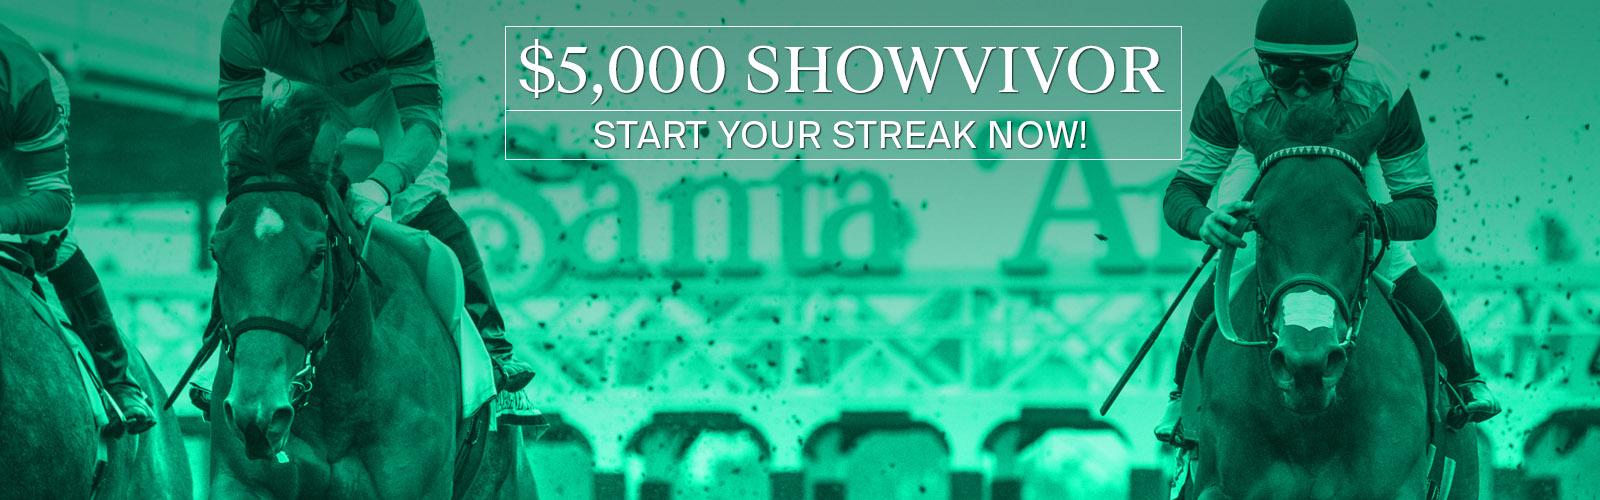 https://showvivor.santaanita.com/images/carousel/homepage-carousel-item-1a.jpg